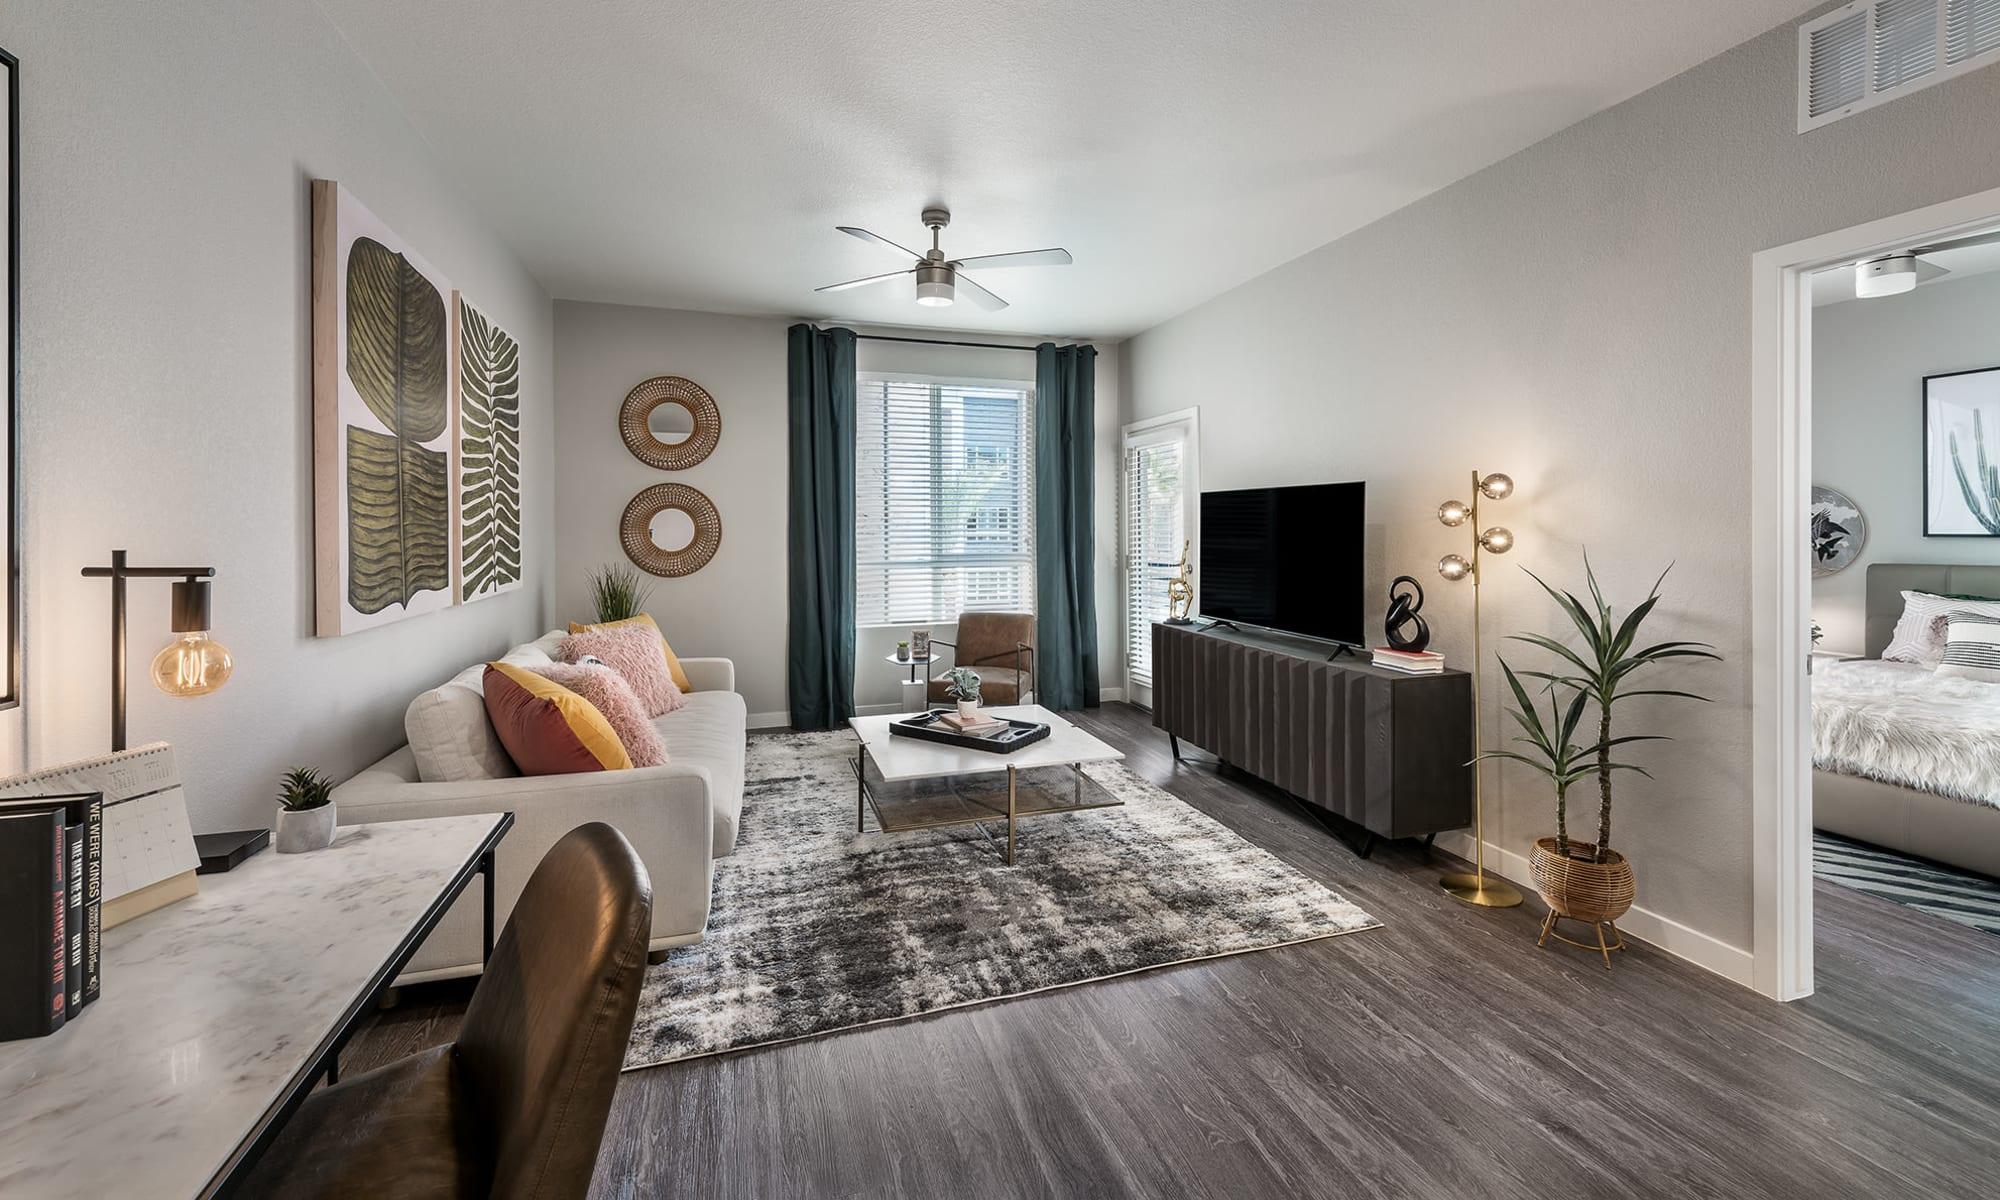 Apartments at ArLo in Phoenix, Arizona